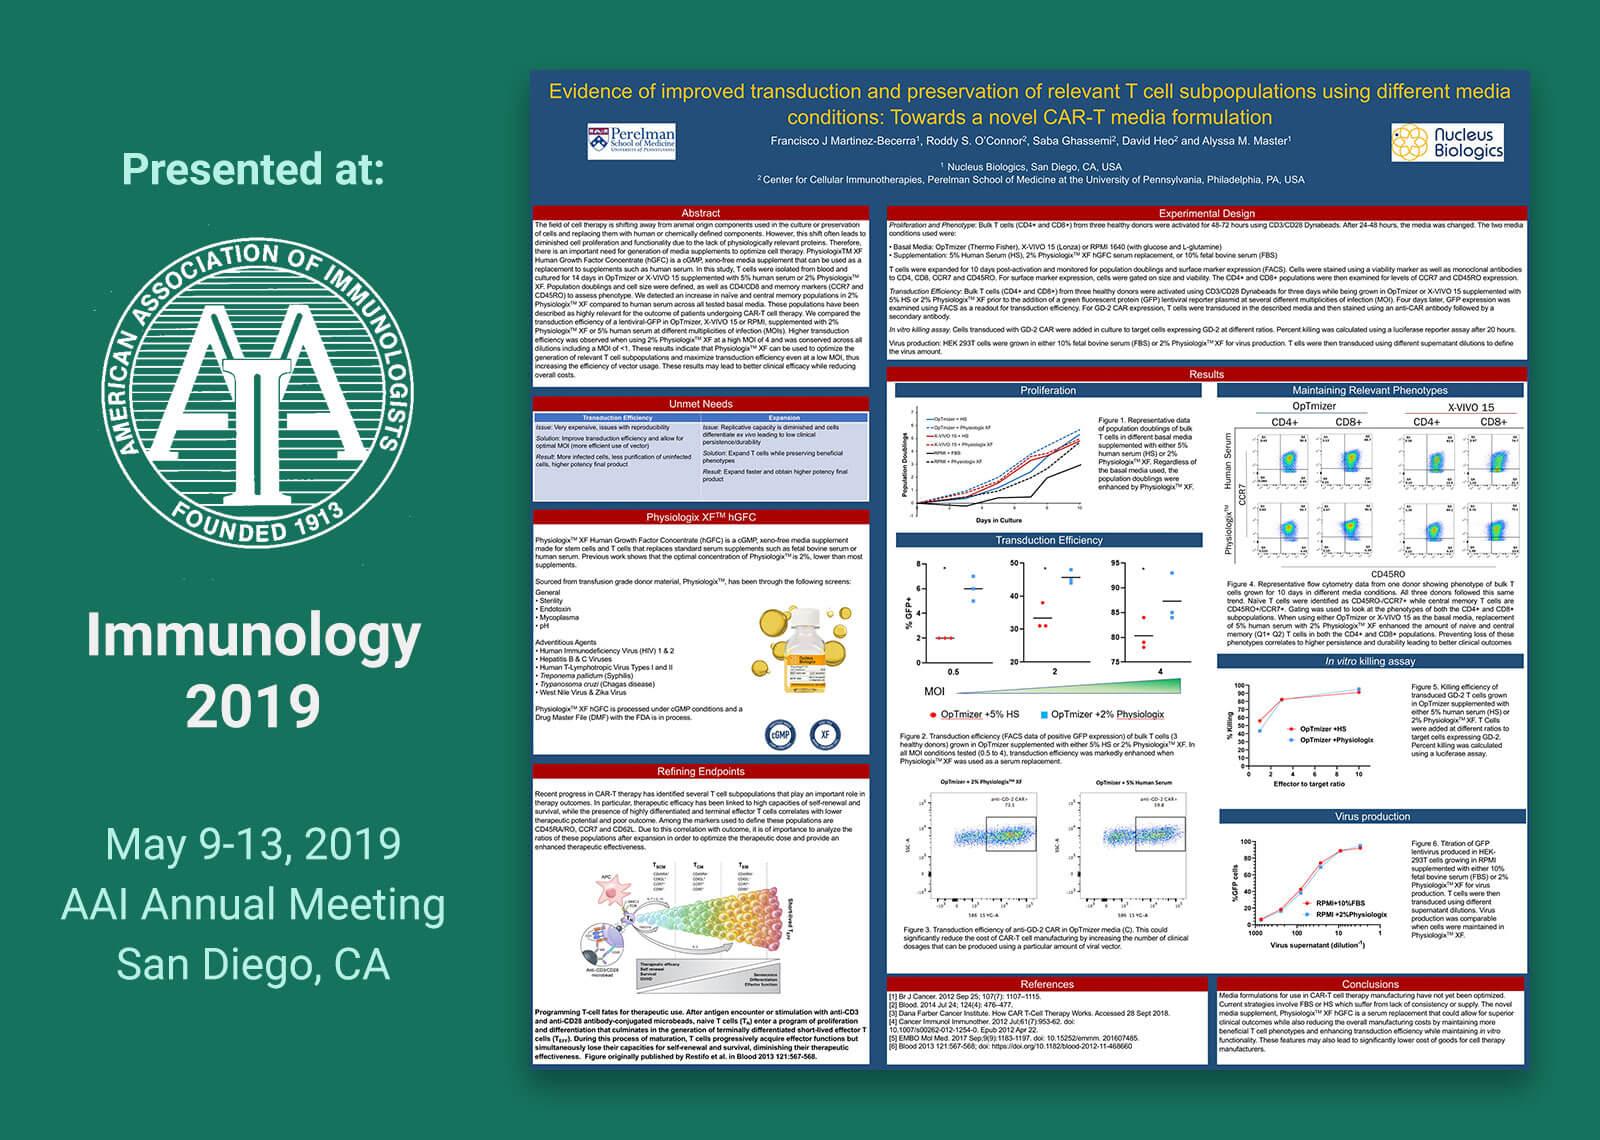 Nucleus Biologics AAI 2019 Poster